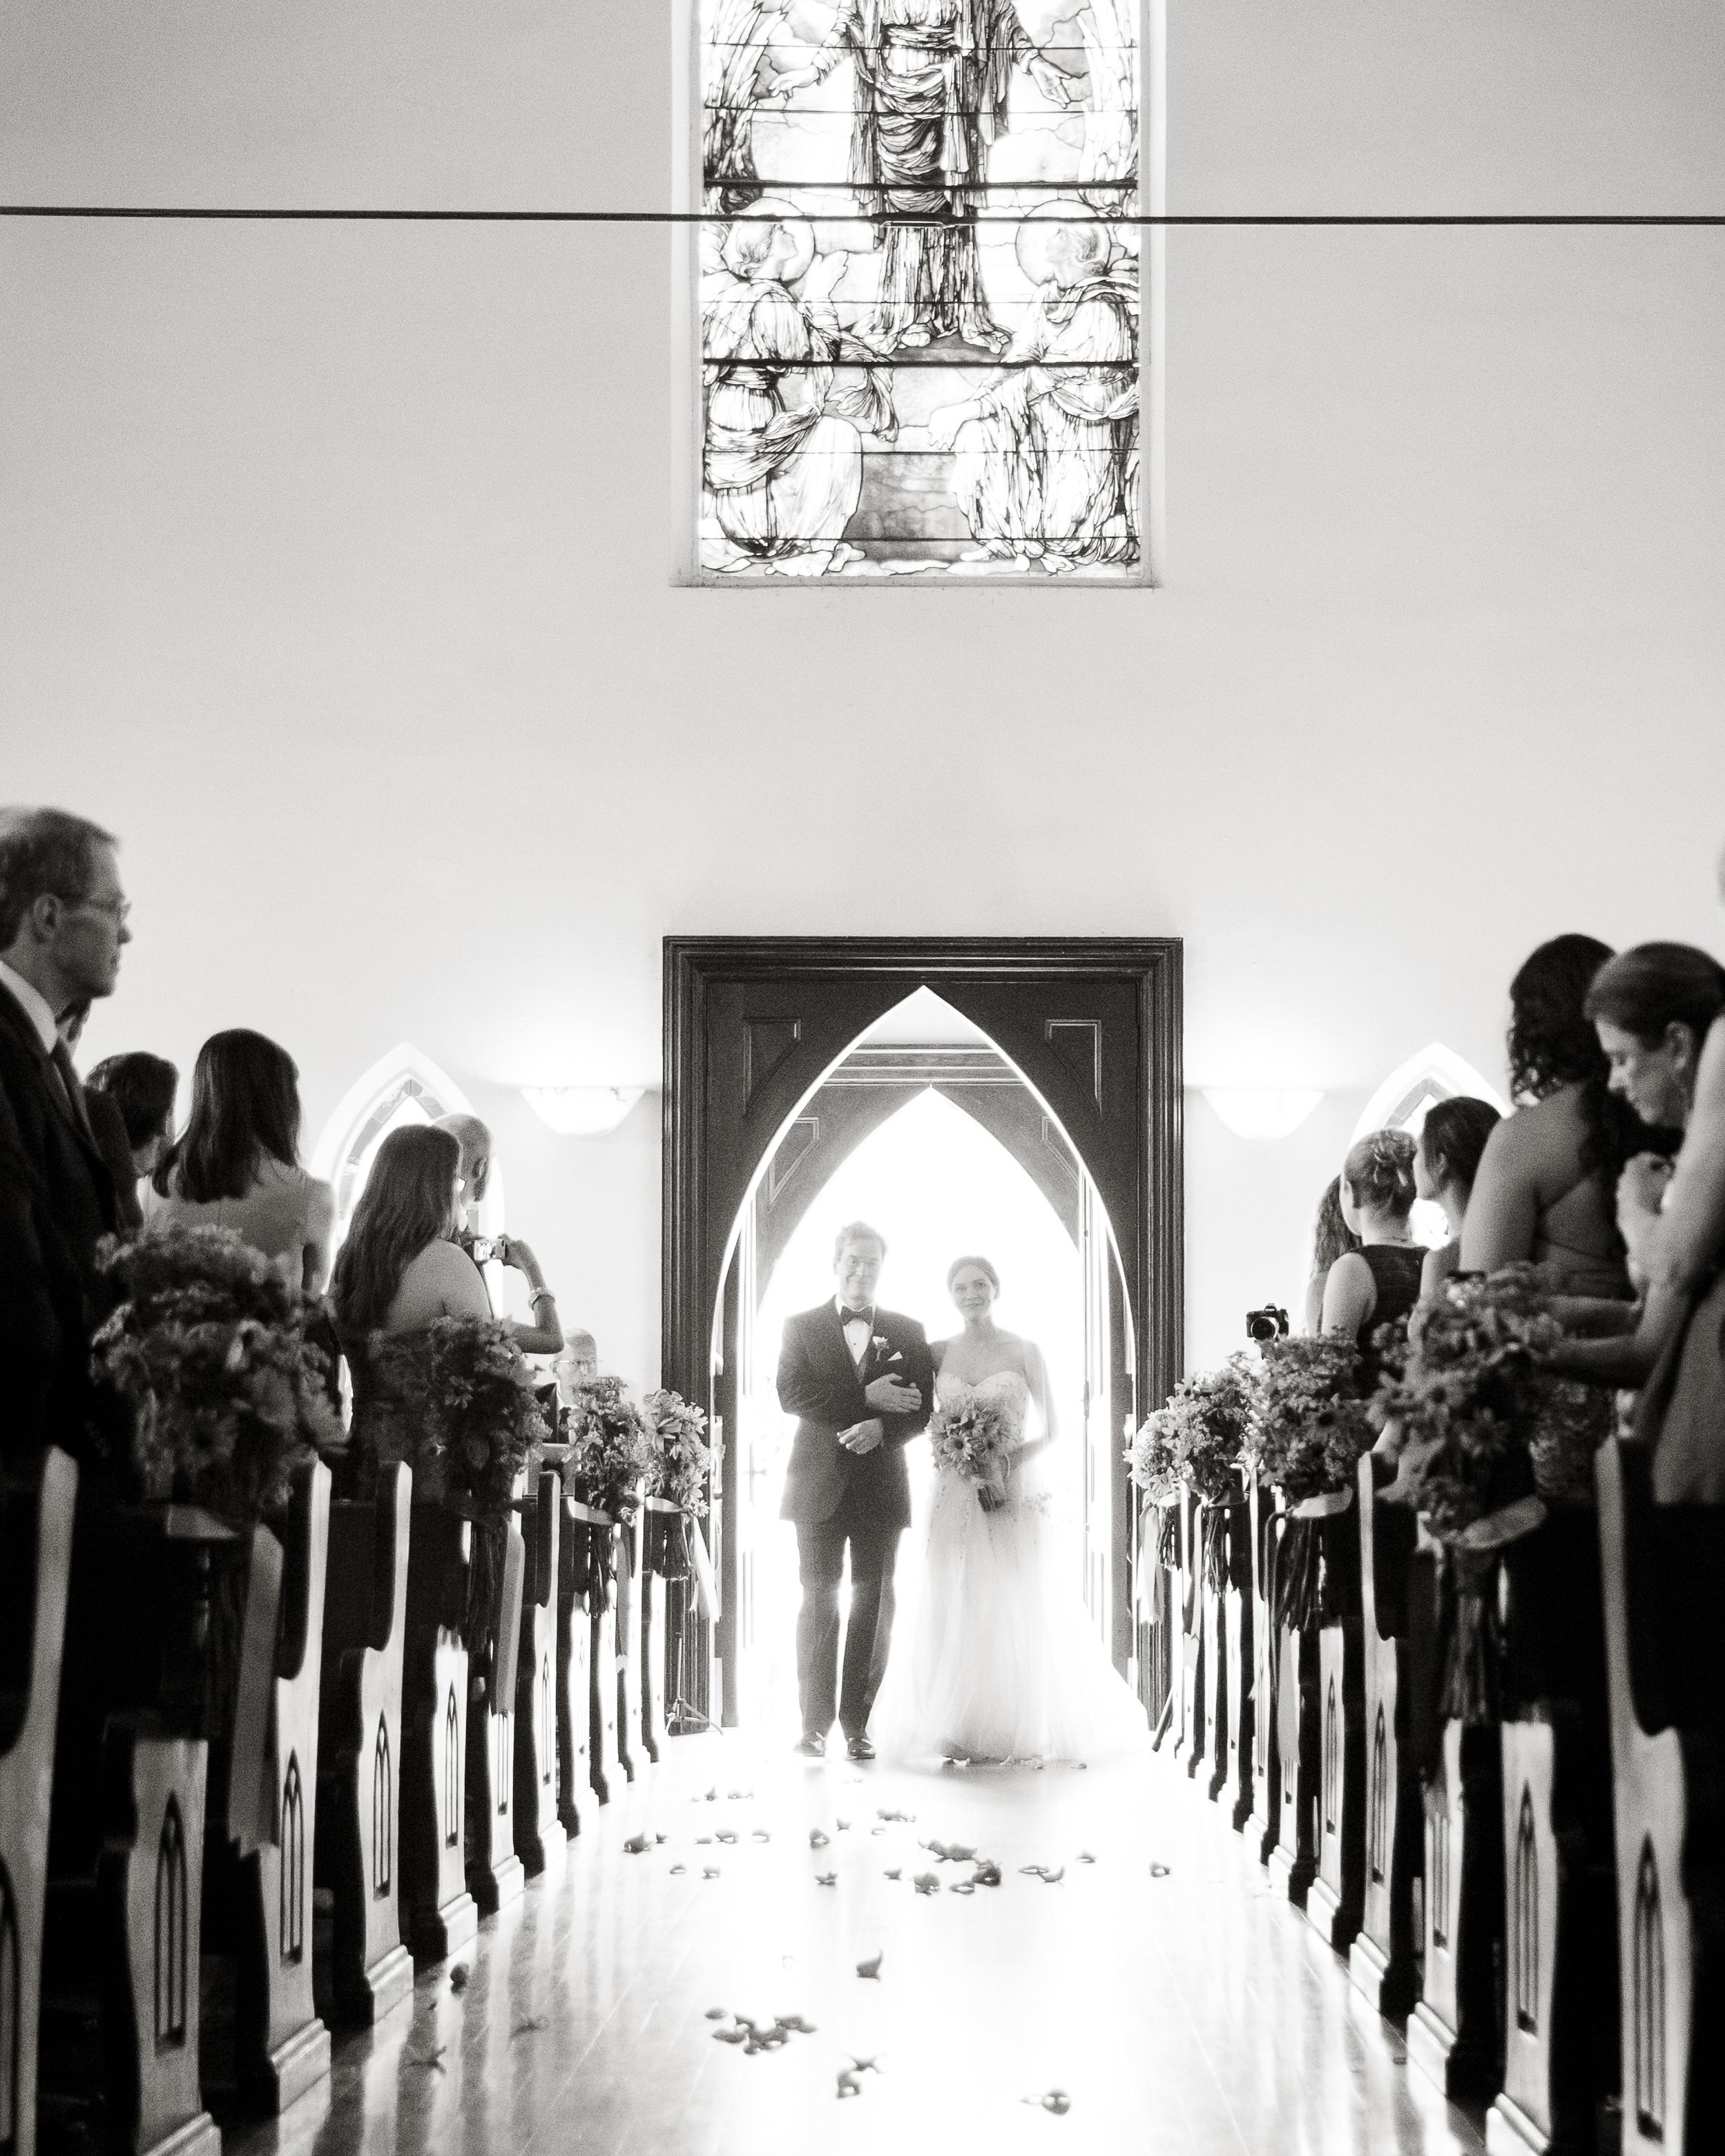 kristel-austin-wedding-entrance-0634-s11860-0415.jpg